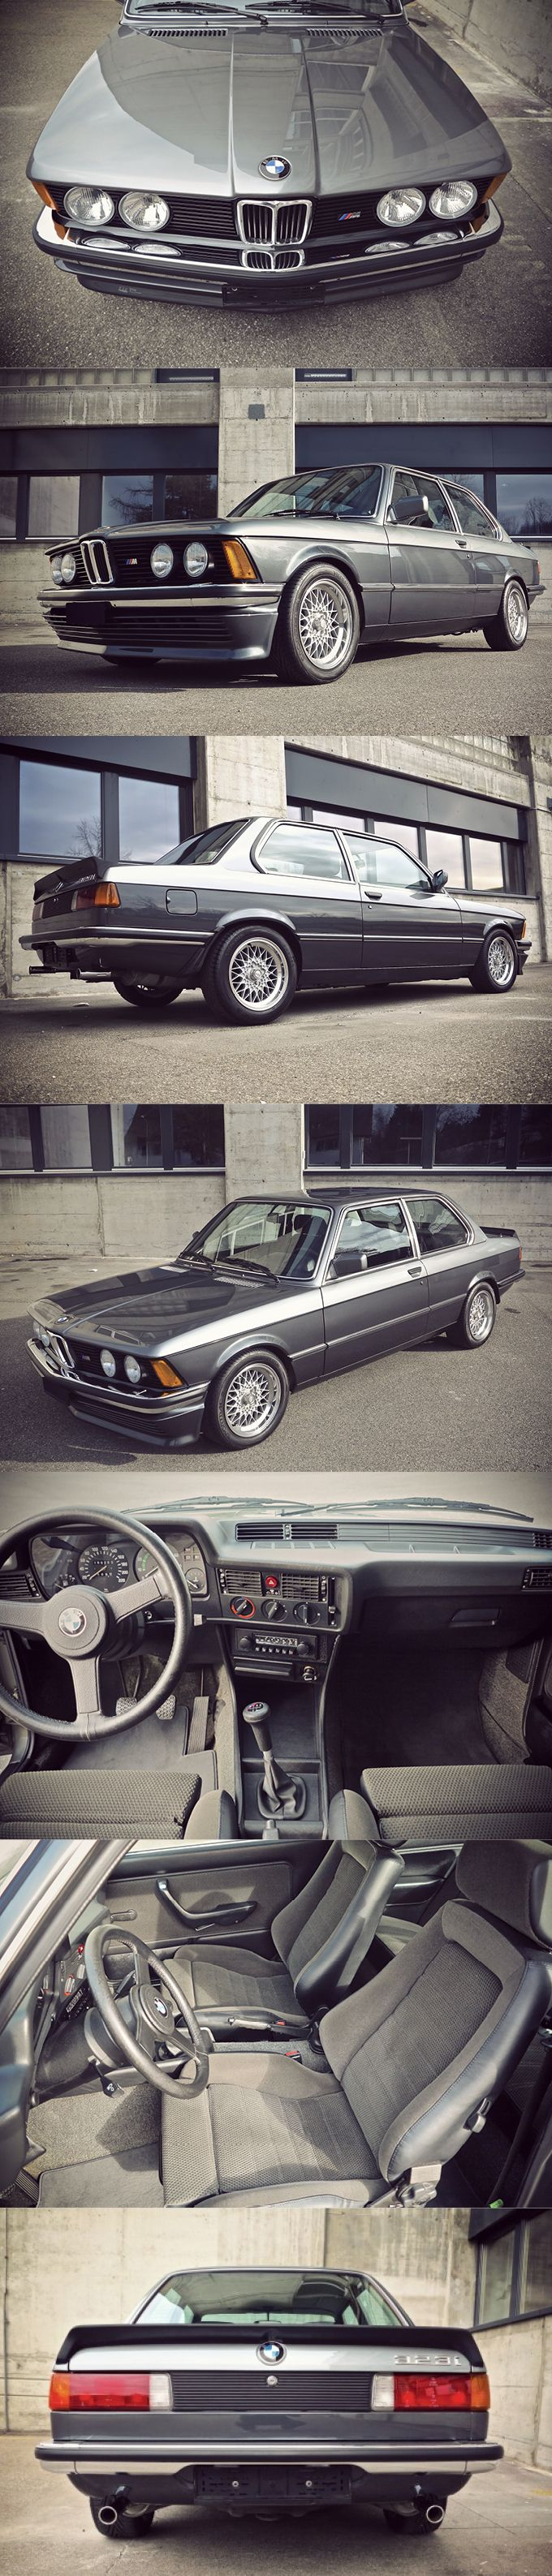 1982 BMW 323i Edition S E21 Germany Two Tone Ascot